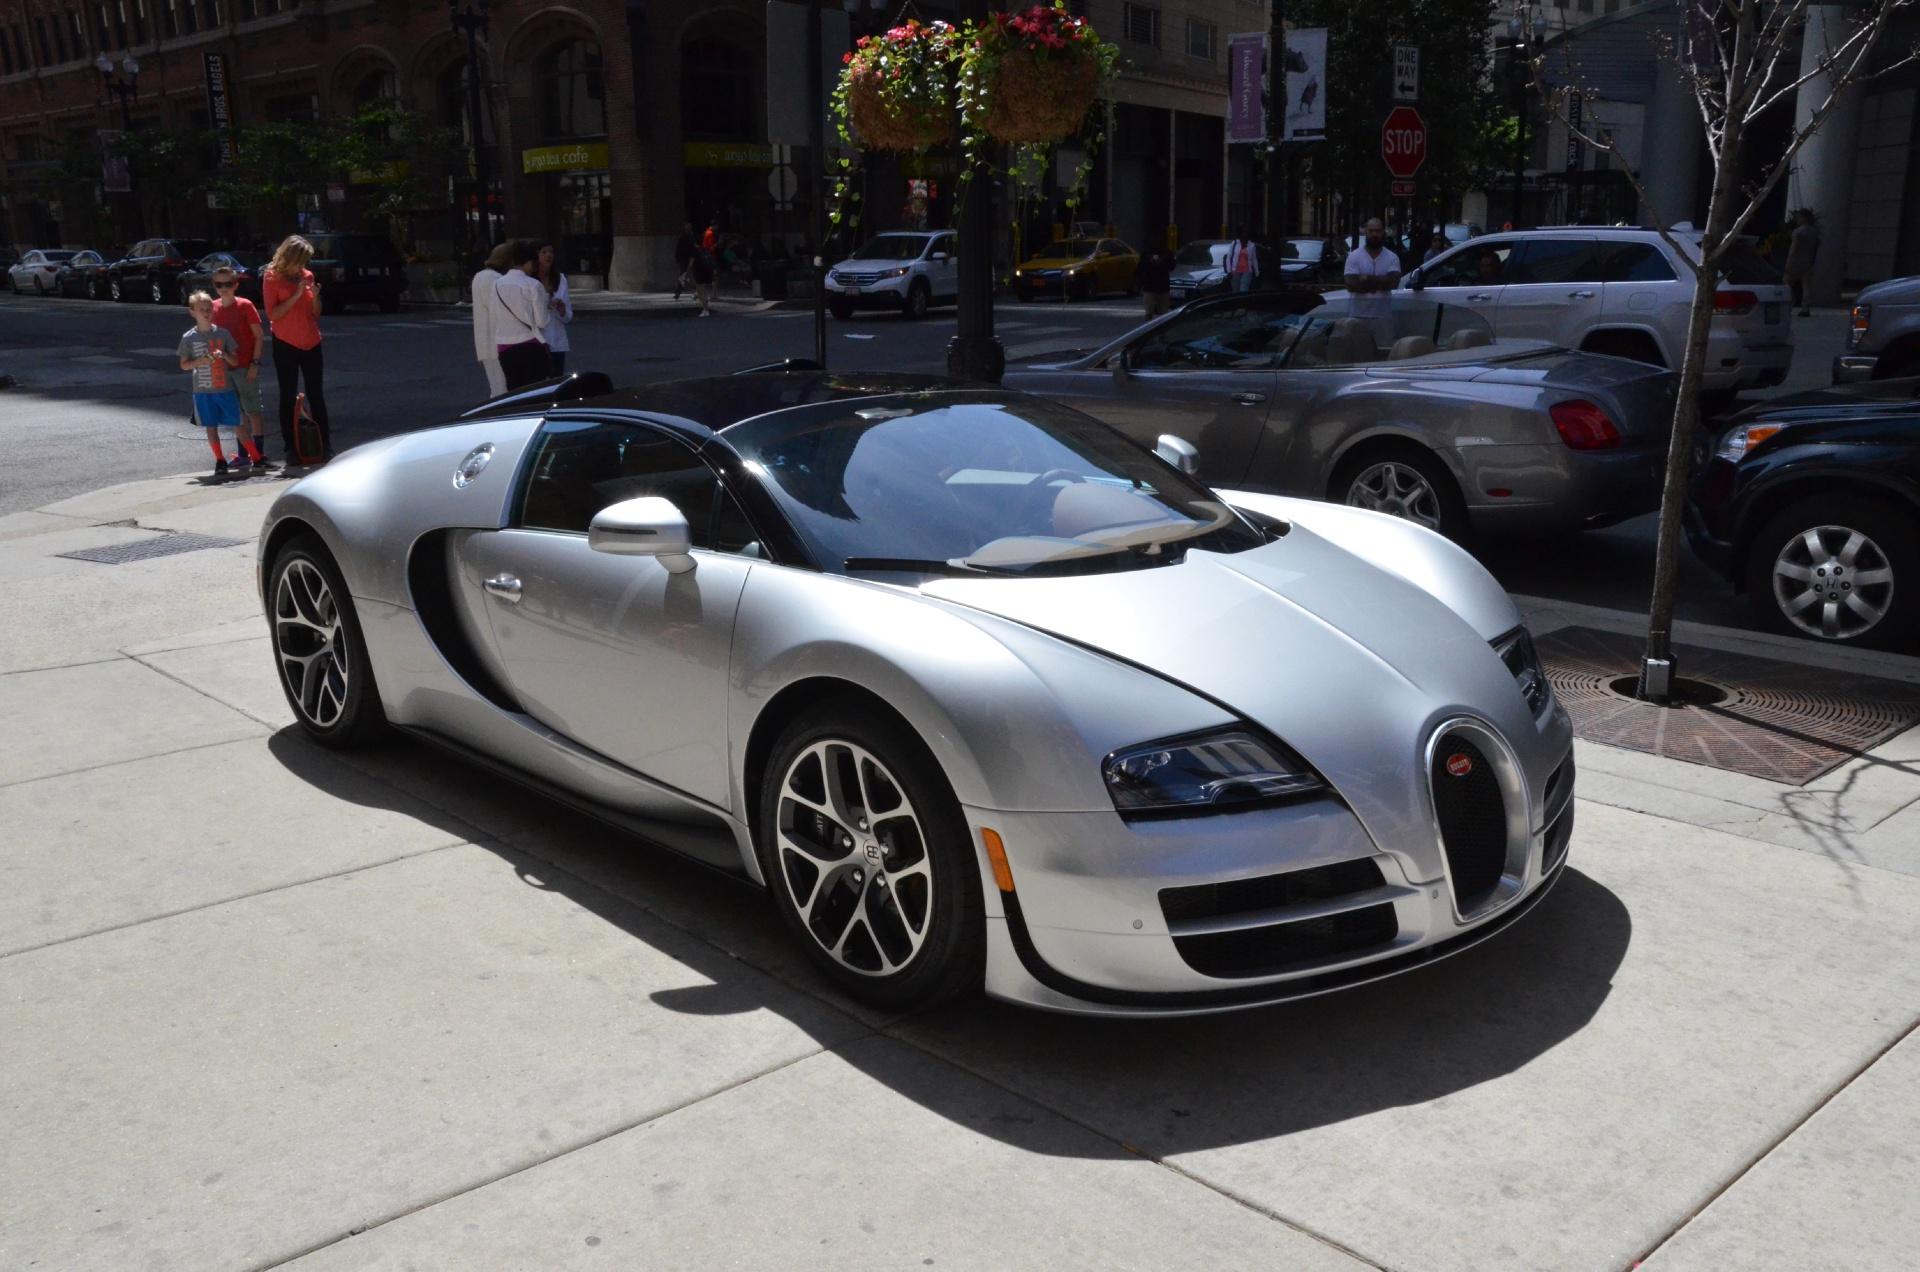 3918_p4_l Extraordinary Bugatti Veyron Grand Sport Vitesse Cars Trend